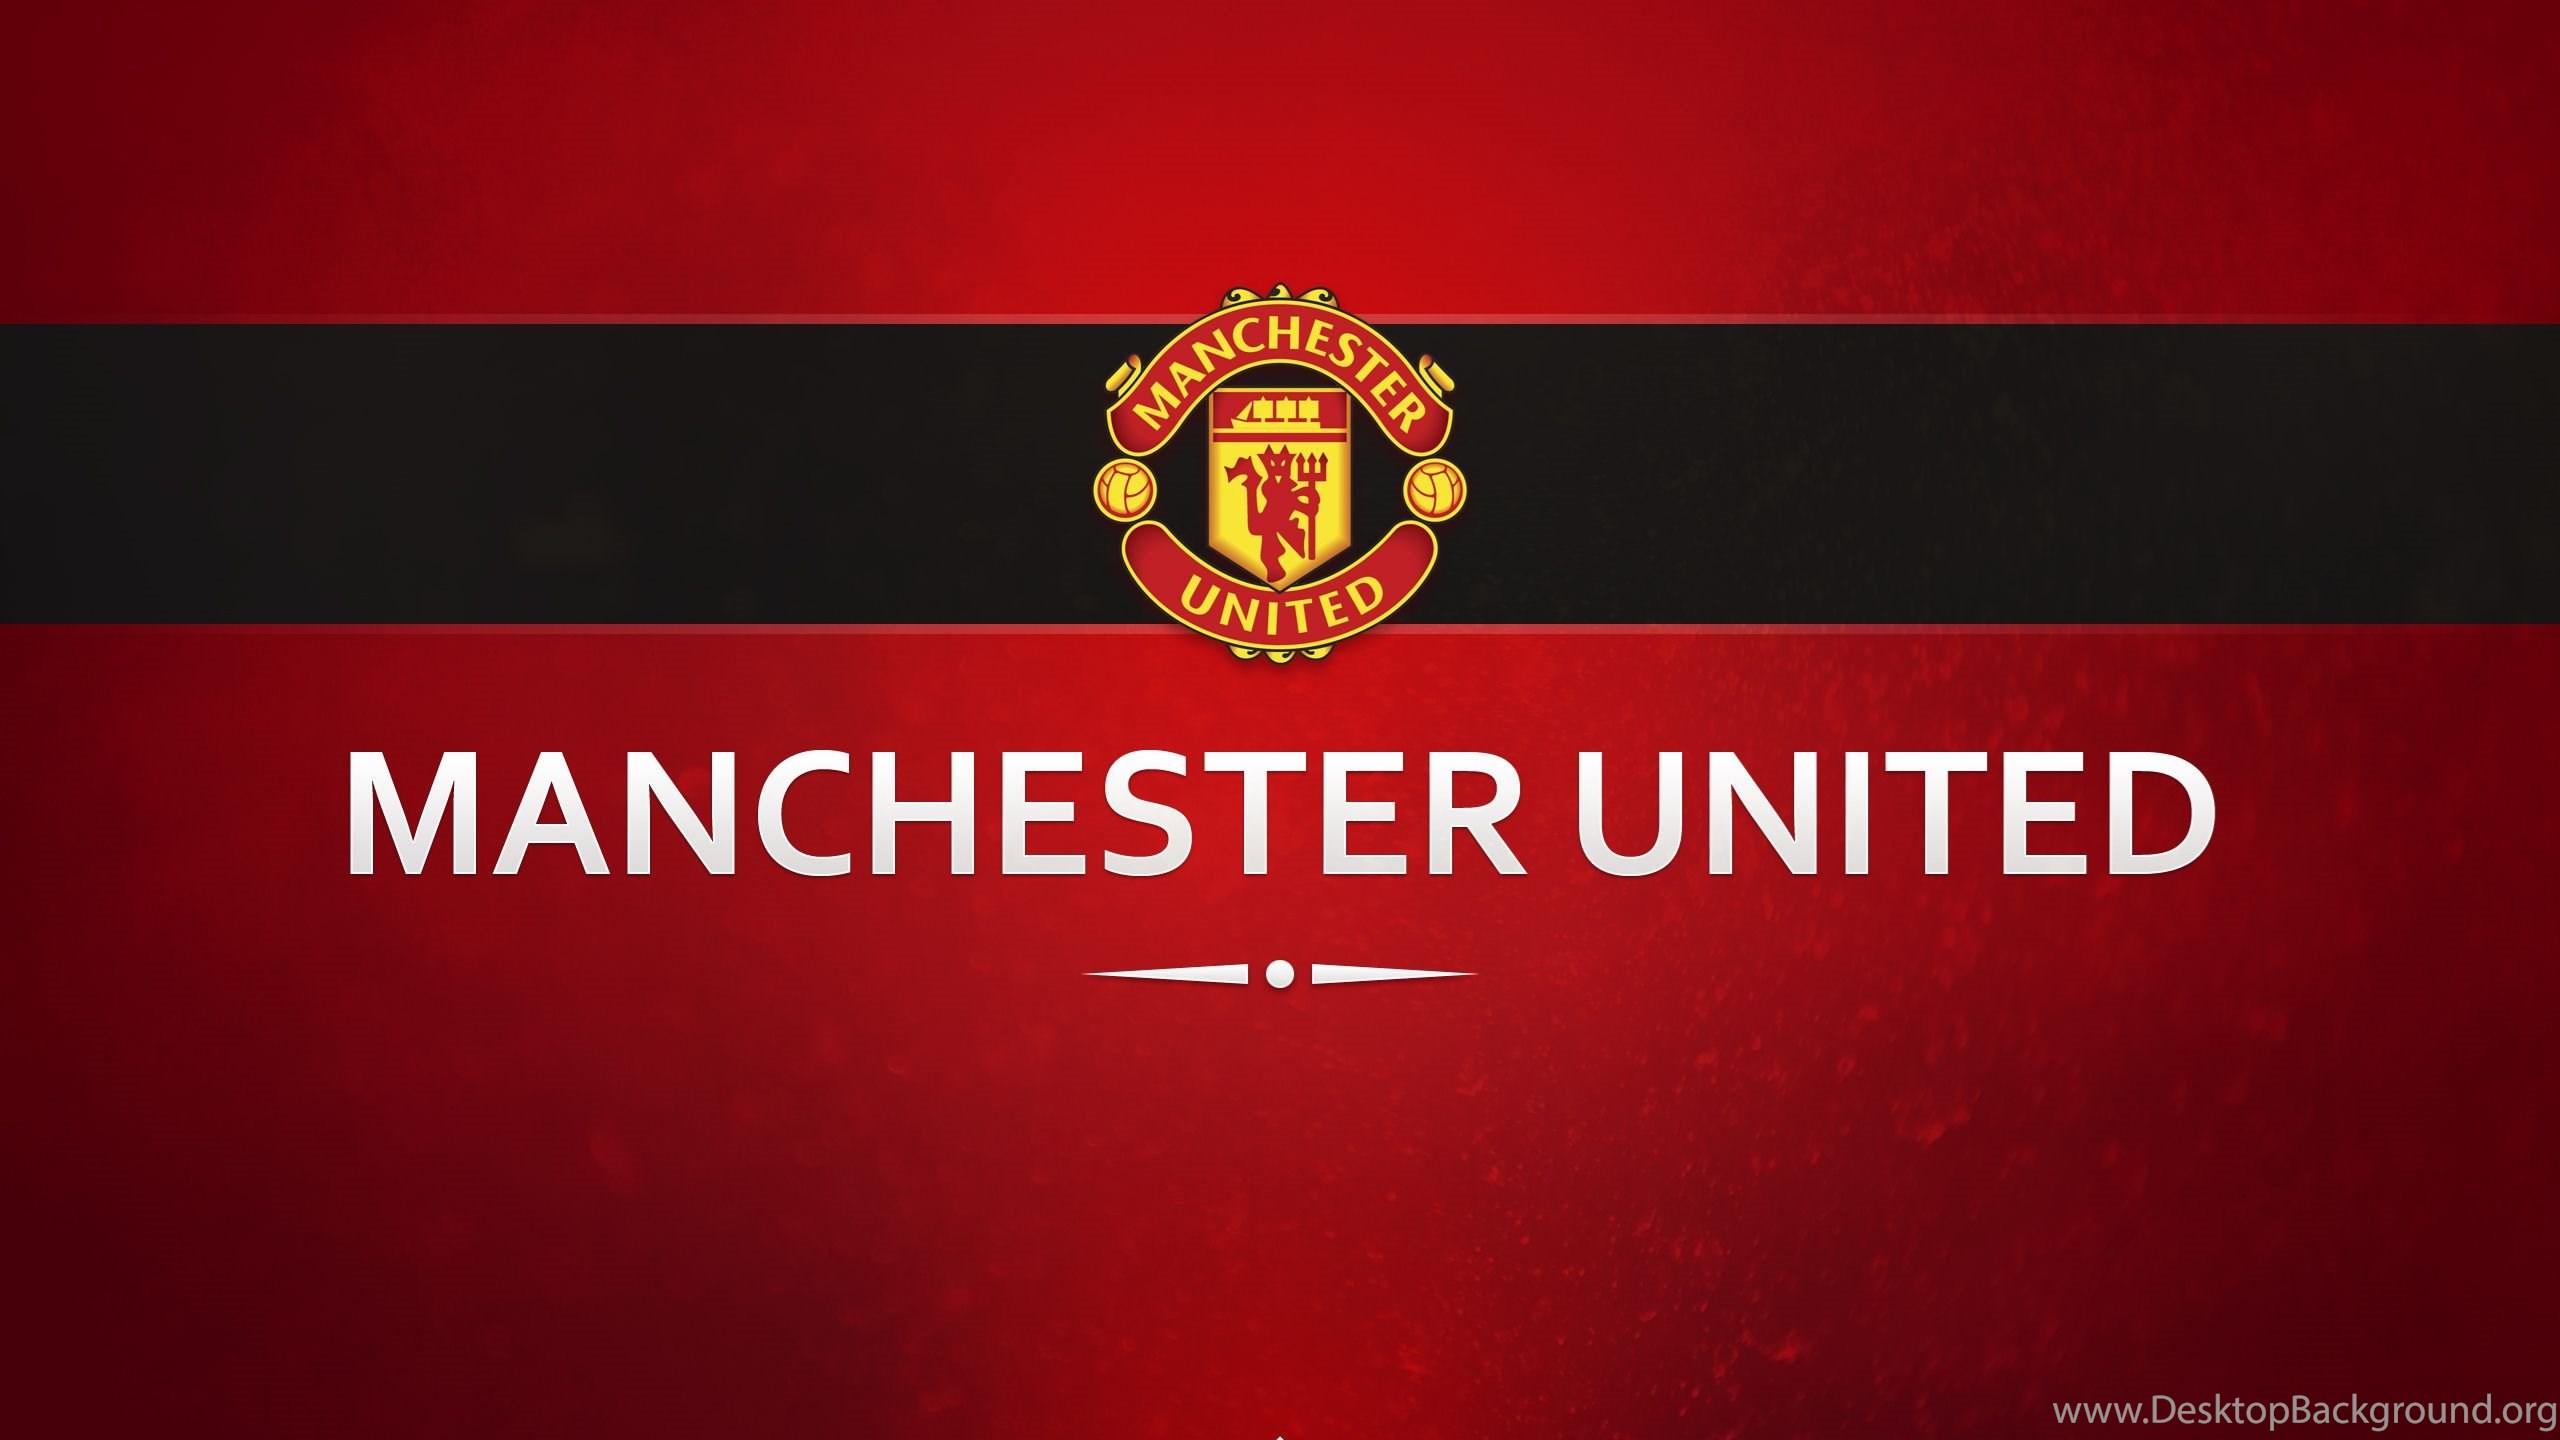 Manchester United Wallpaper Image Picture Logo Jpg Desktop